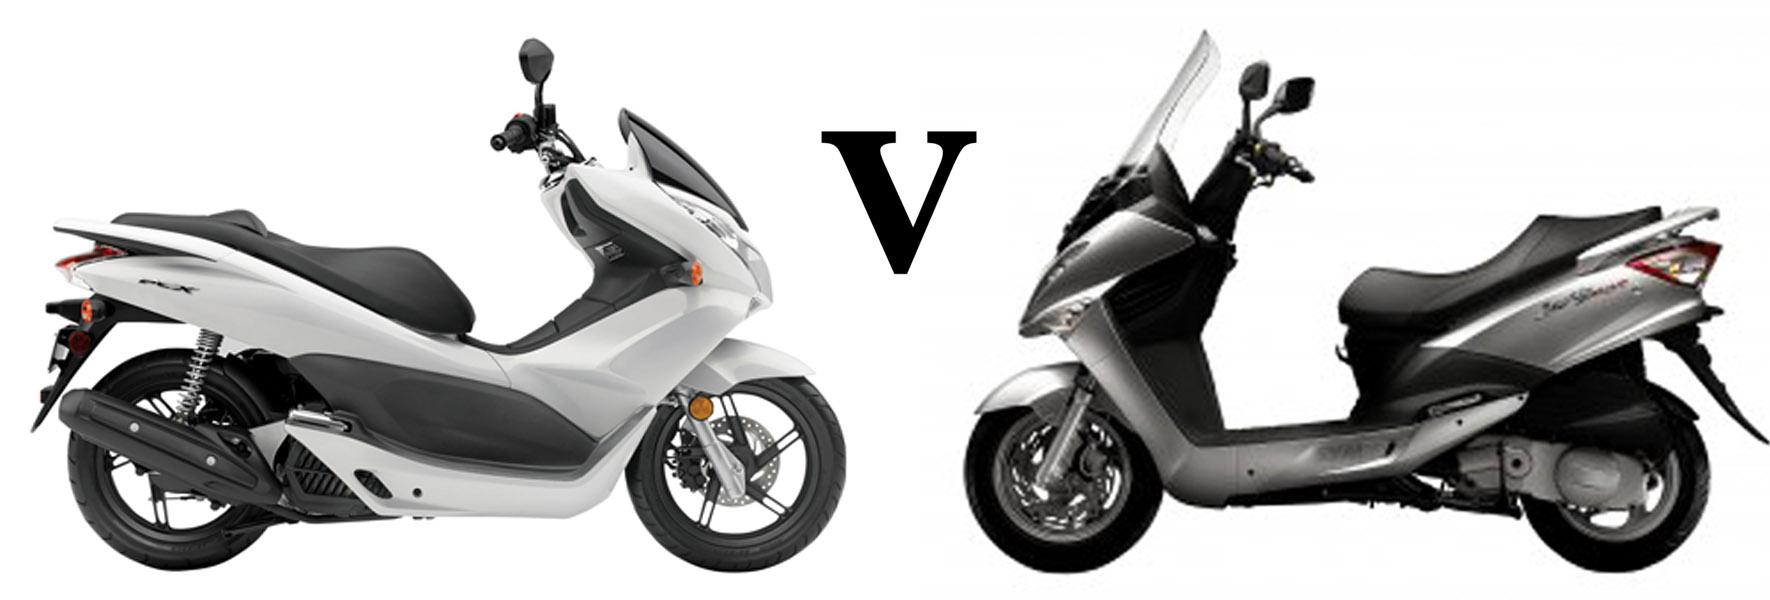 Versus: Honda PCX125 vs Sym Joyride 125